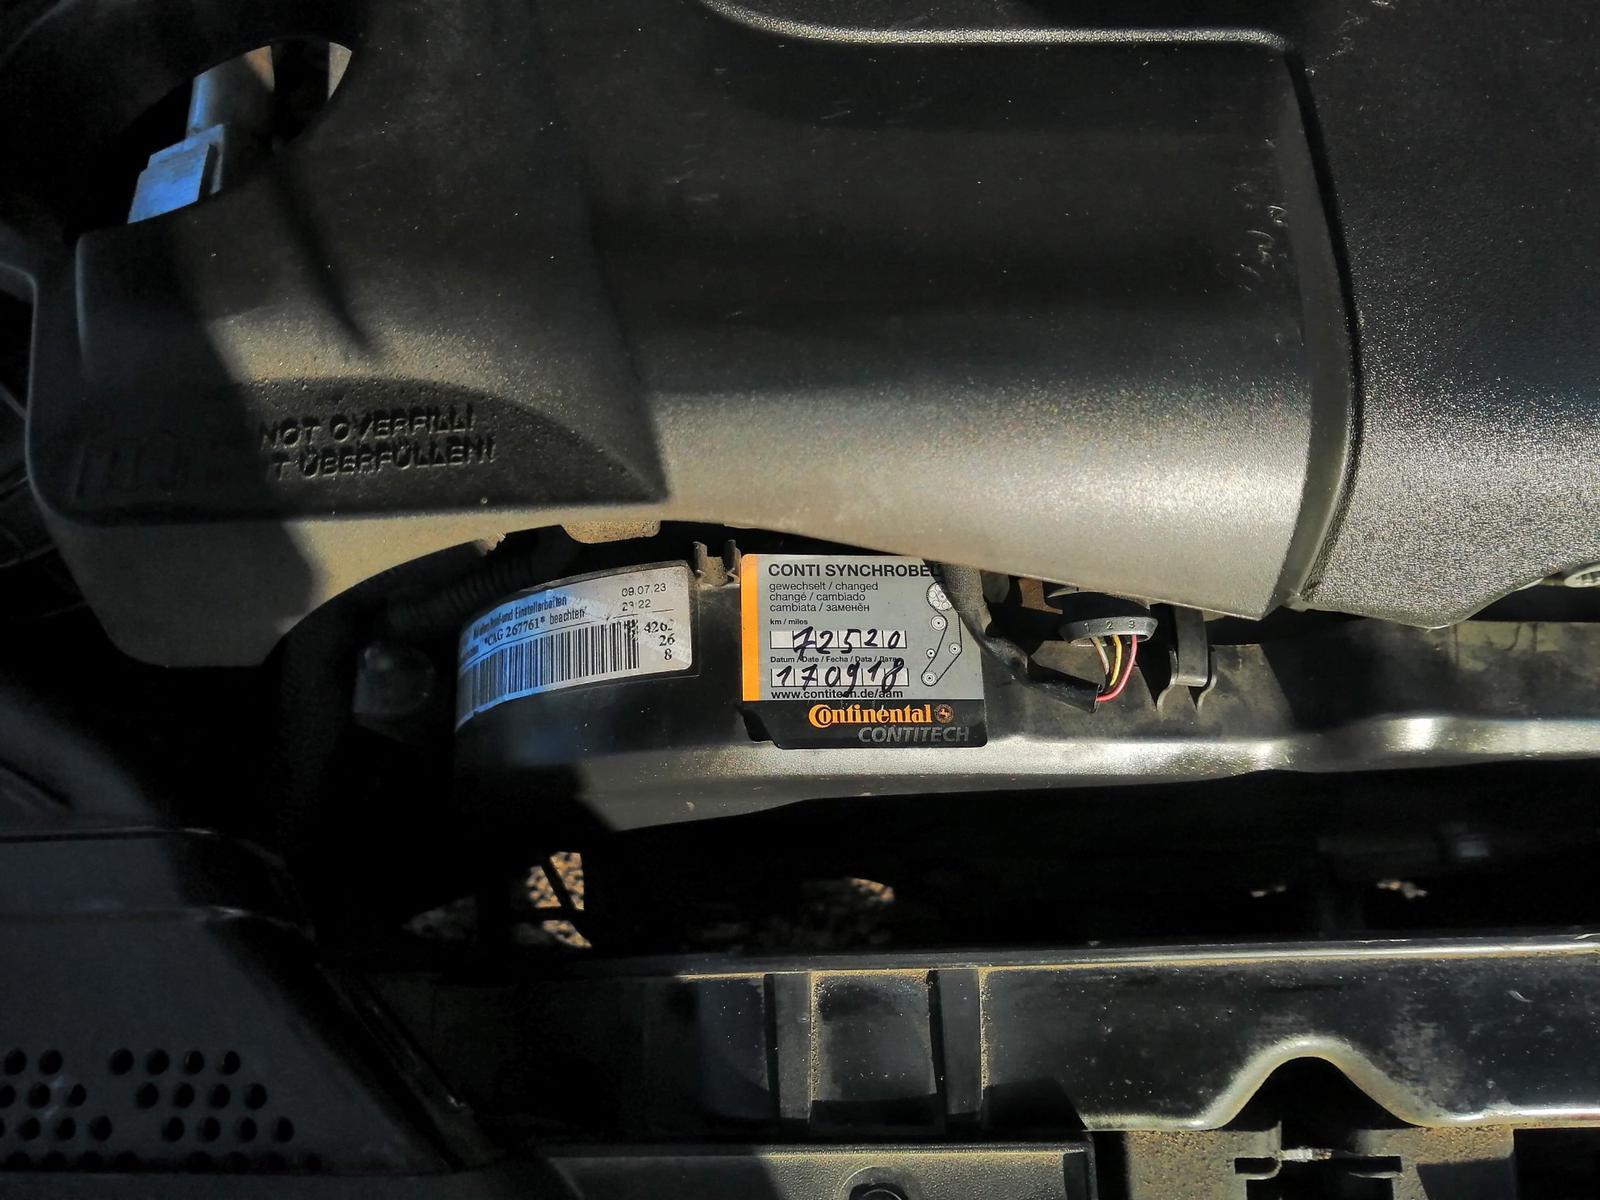 2009/59 REG AUDI A4 S LINE TDI 2.0 DIESEL BLACK 4 DOOR SALOON, SHOWING 2 FORMER KEEPERS *NO VAT* - Image 9 of 13